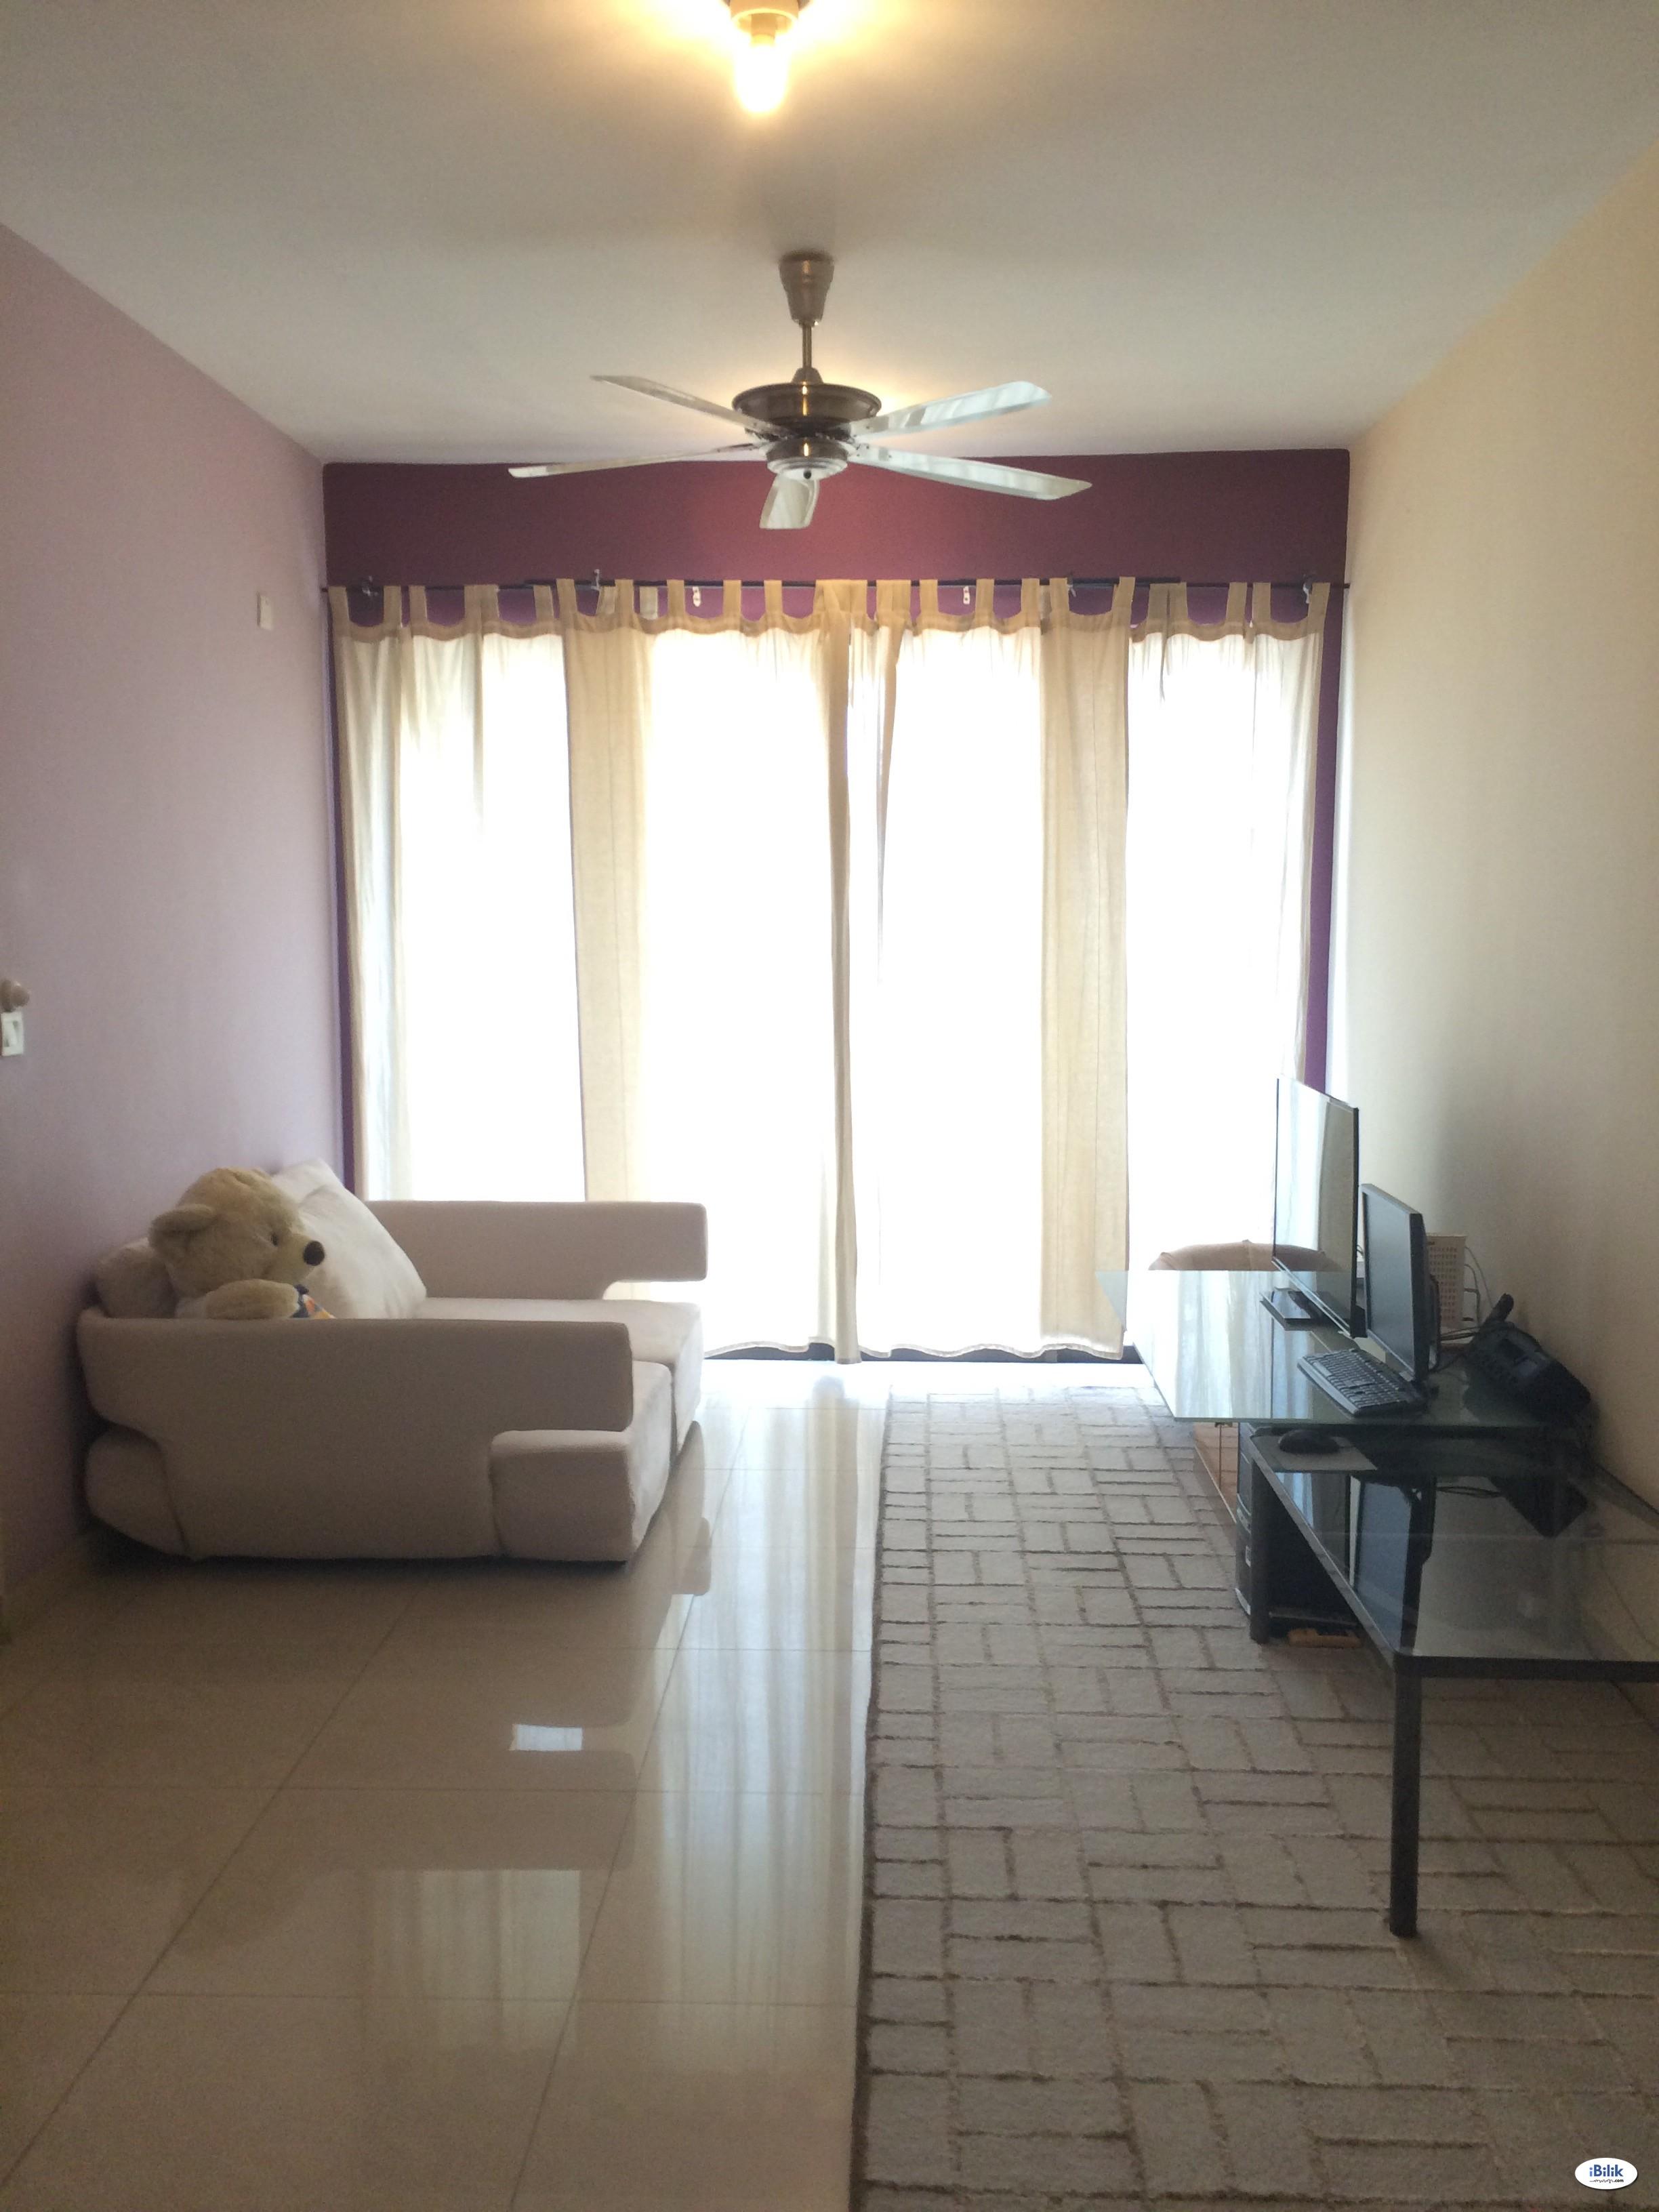 Middle Room at Rivercity, Sentul